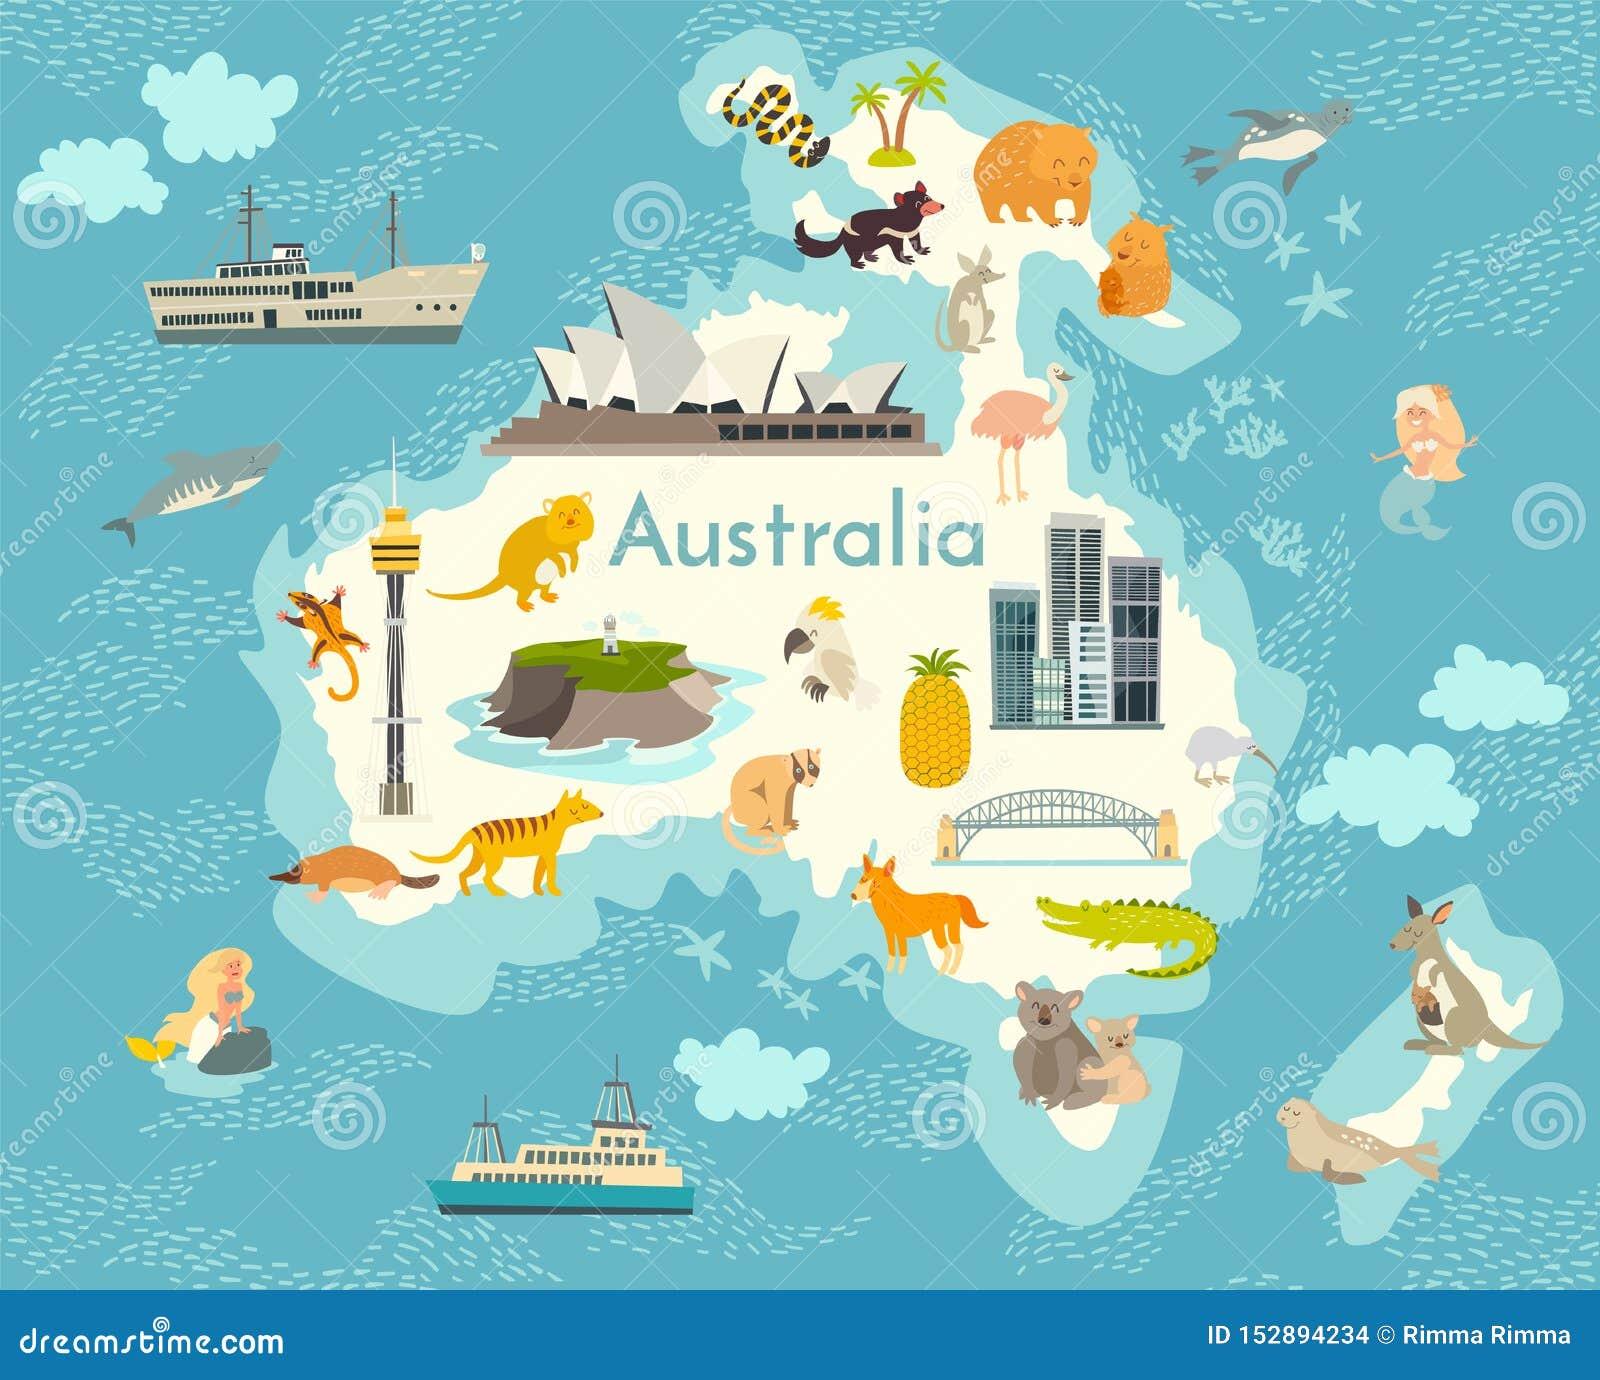 Australia Map Landmarks.Australia Continent World Vector Map With Landmarks Cartoon